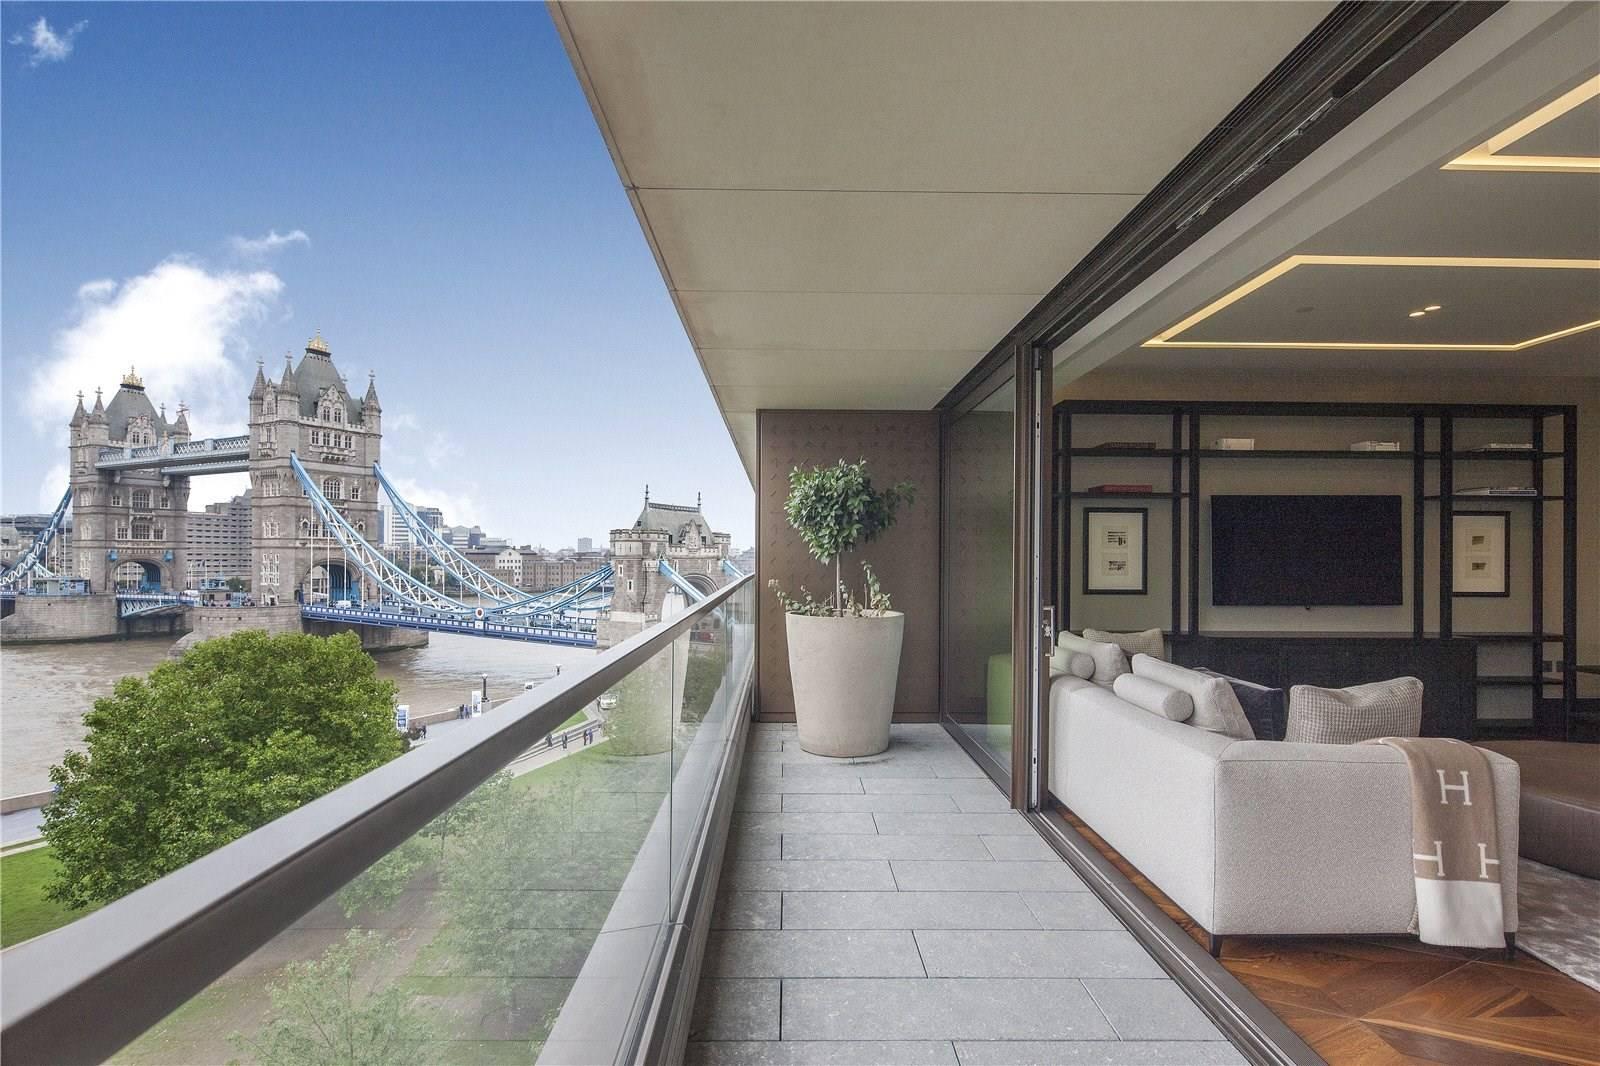 Stunning apartment overlooking Tower Bridge